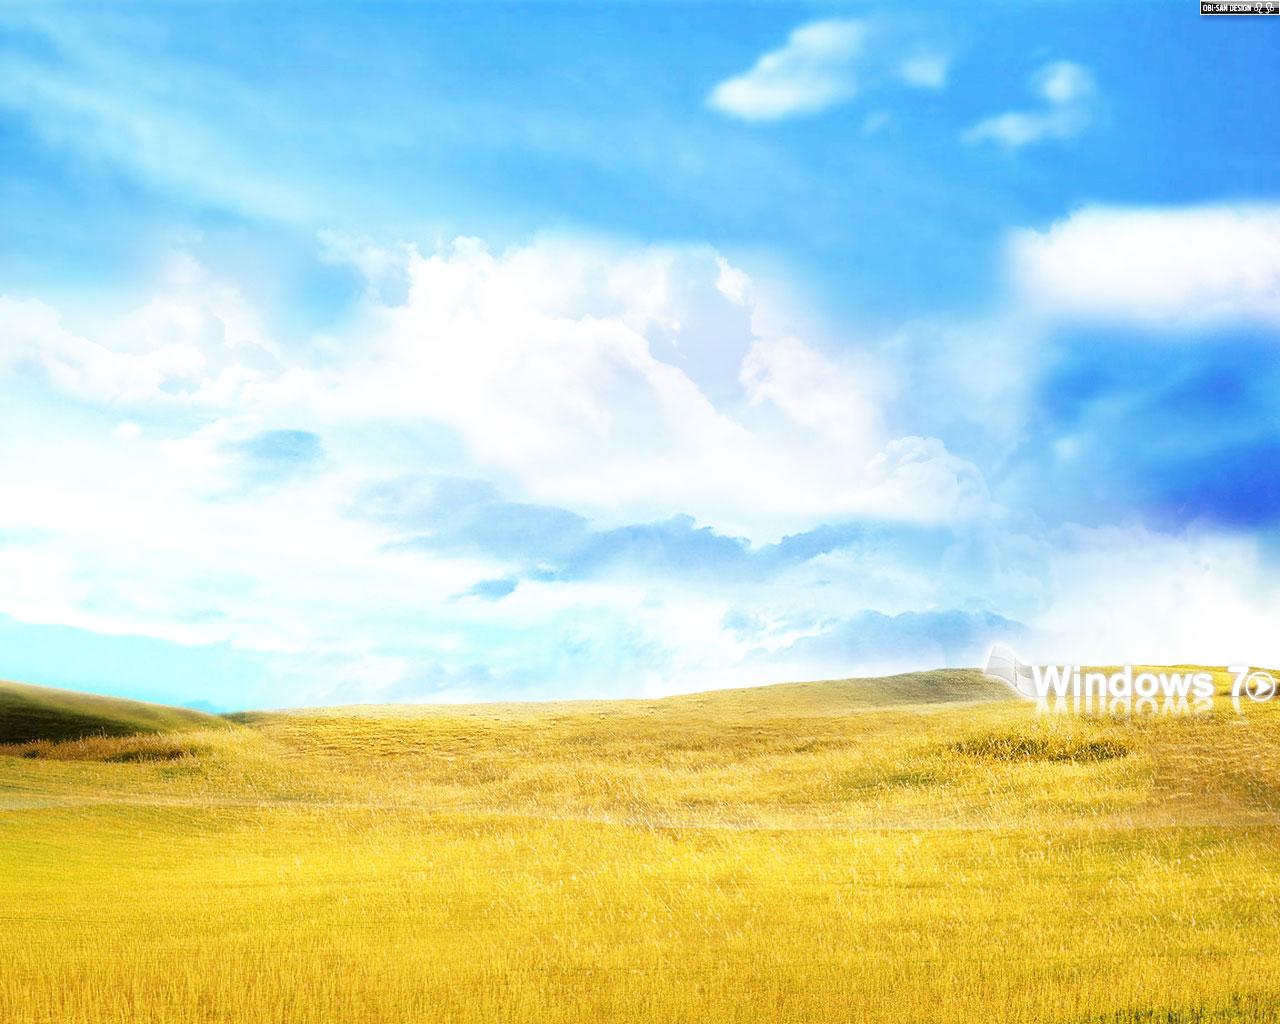 https://1.bp.blogspot.com/-4xpBBqU_Me8/TVaxnr-mvNI/AAAAAAAABWk/rSz5MvEbbCA/s1600/windows-7-wallpaper-046.jpg